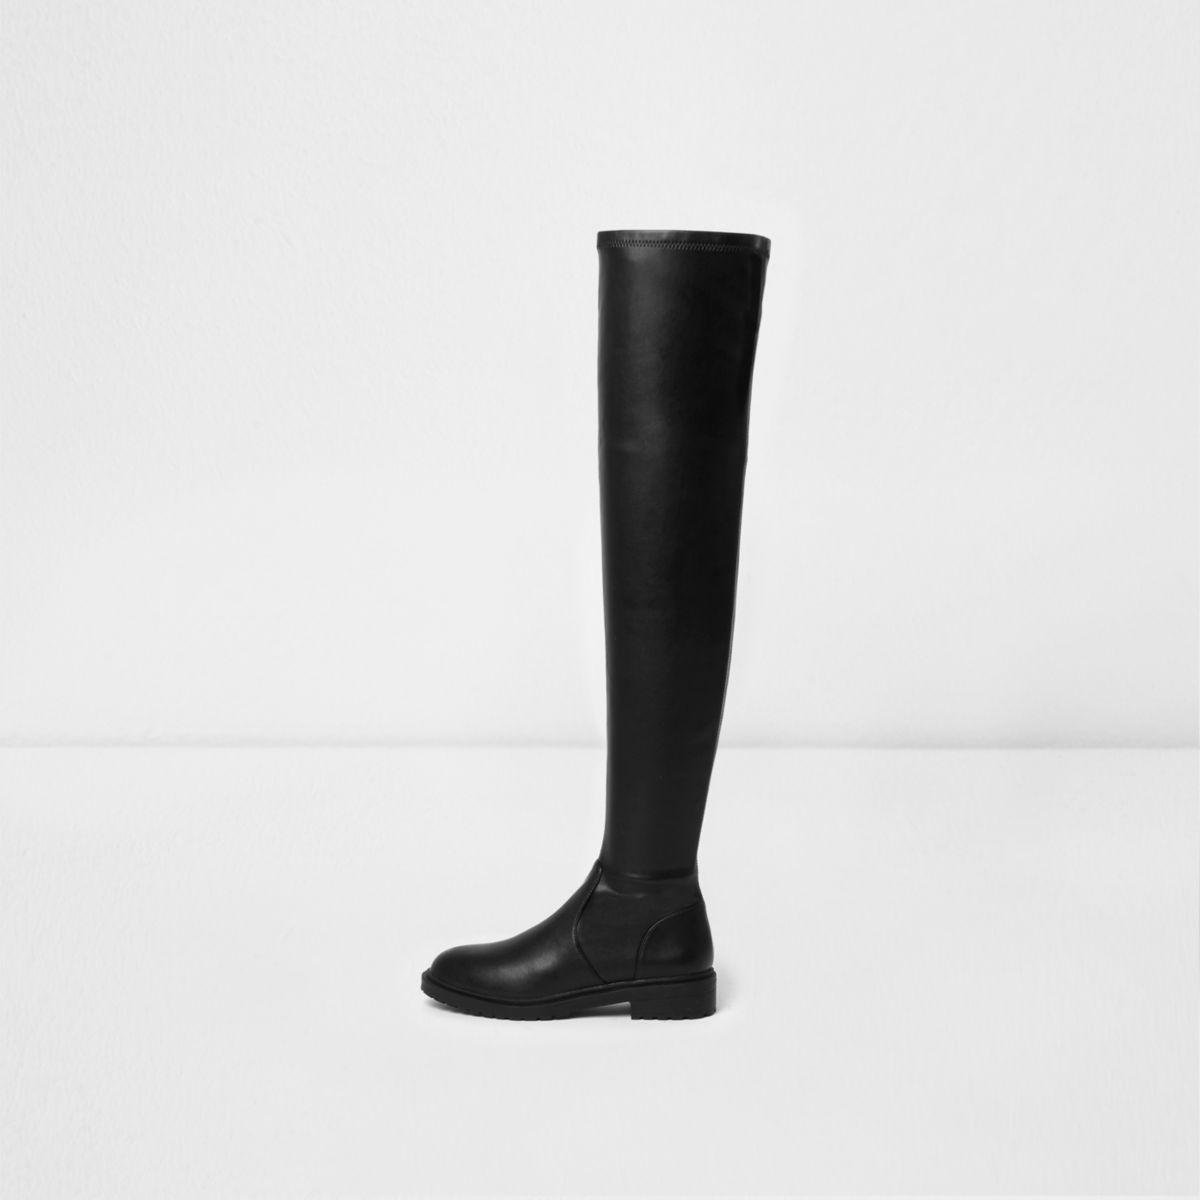 Schwarze, grobe Overknee-Stiefel